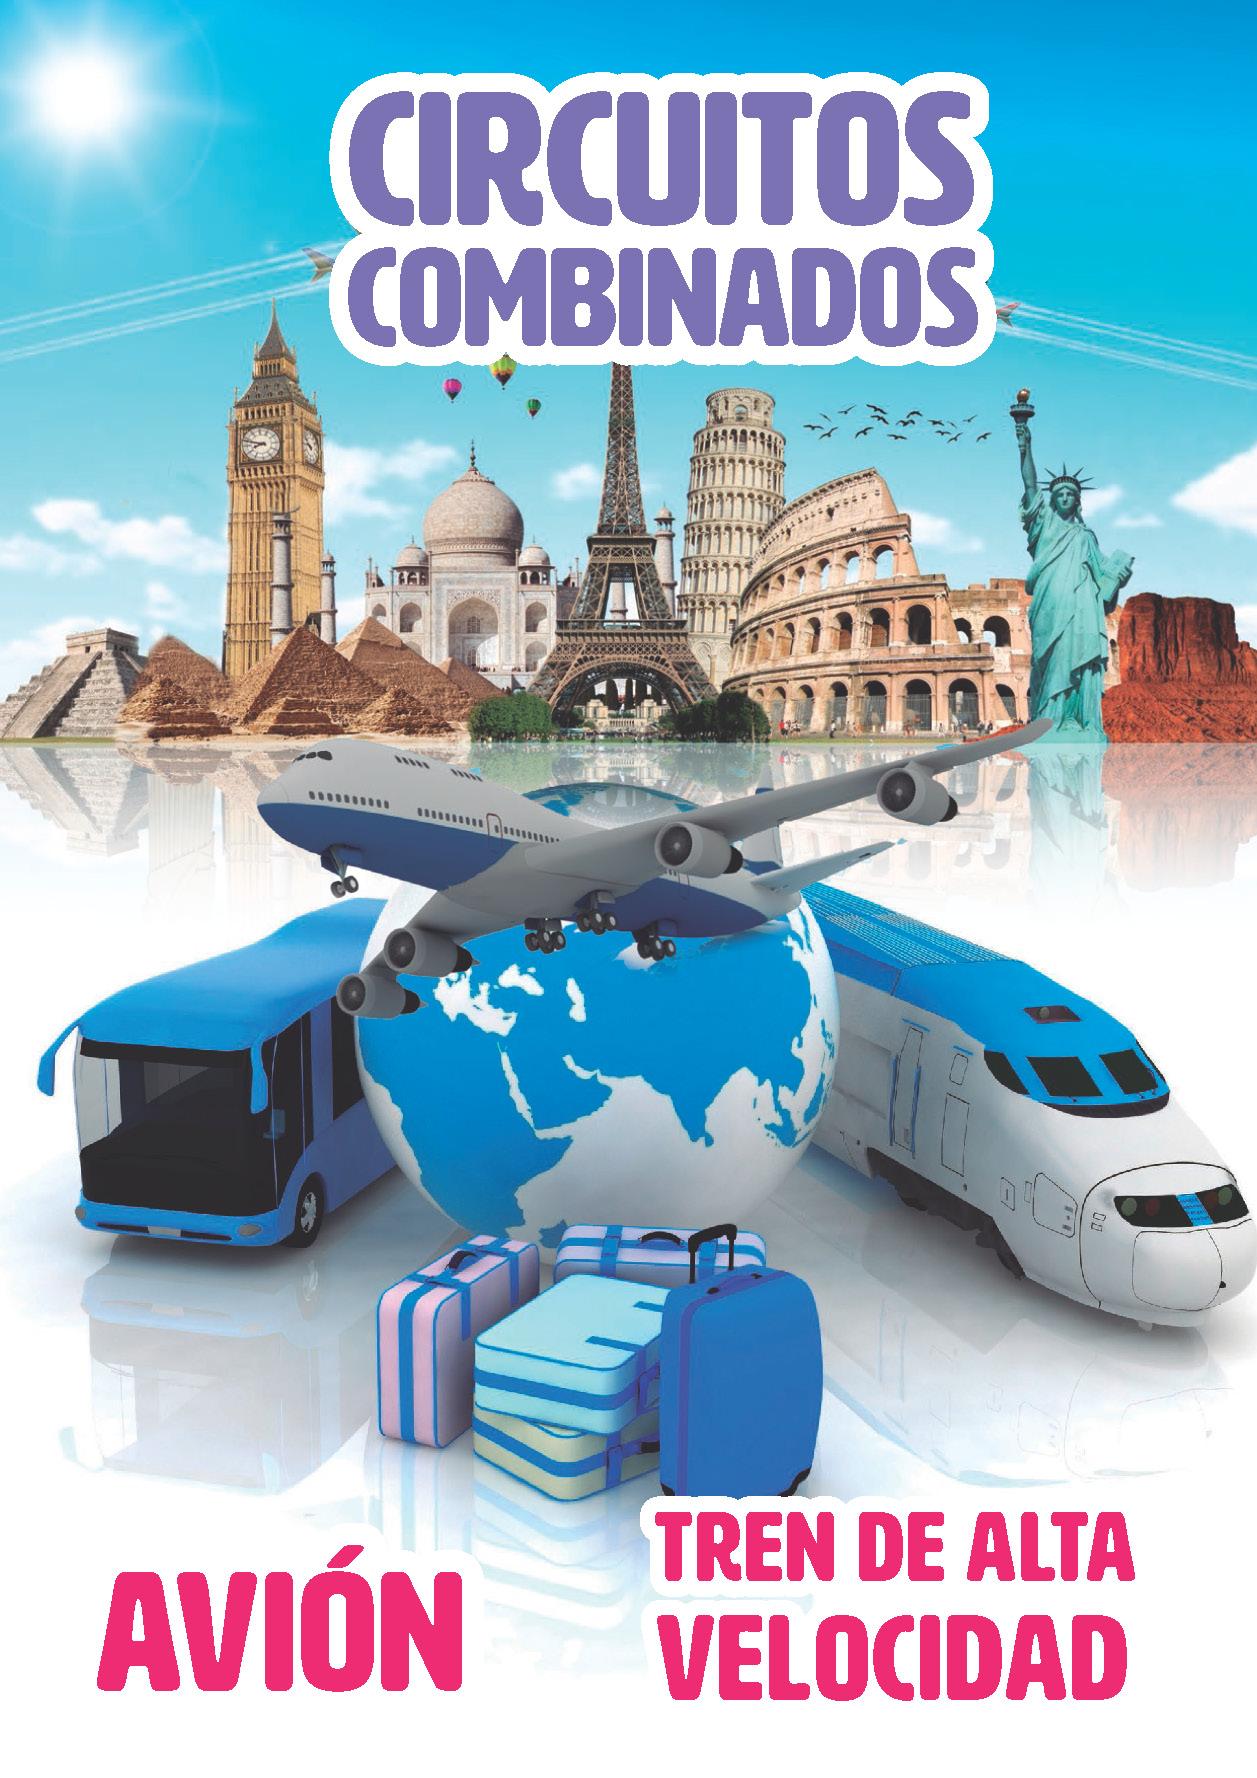 Catalogo Europamundo Vacaciones Circuitos Combinados 2018-2019